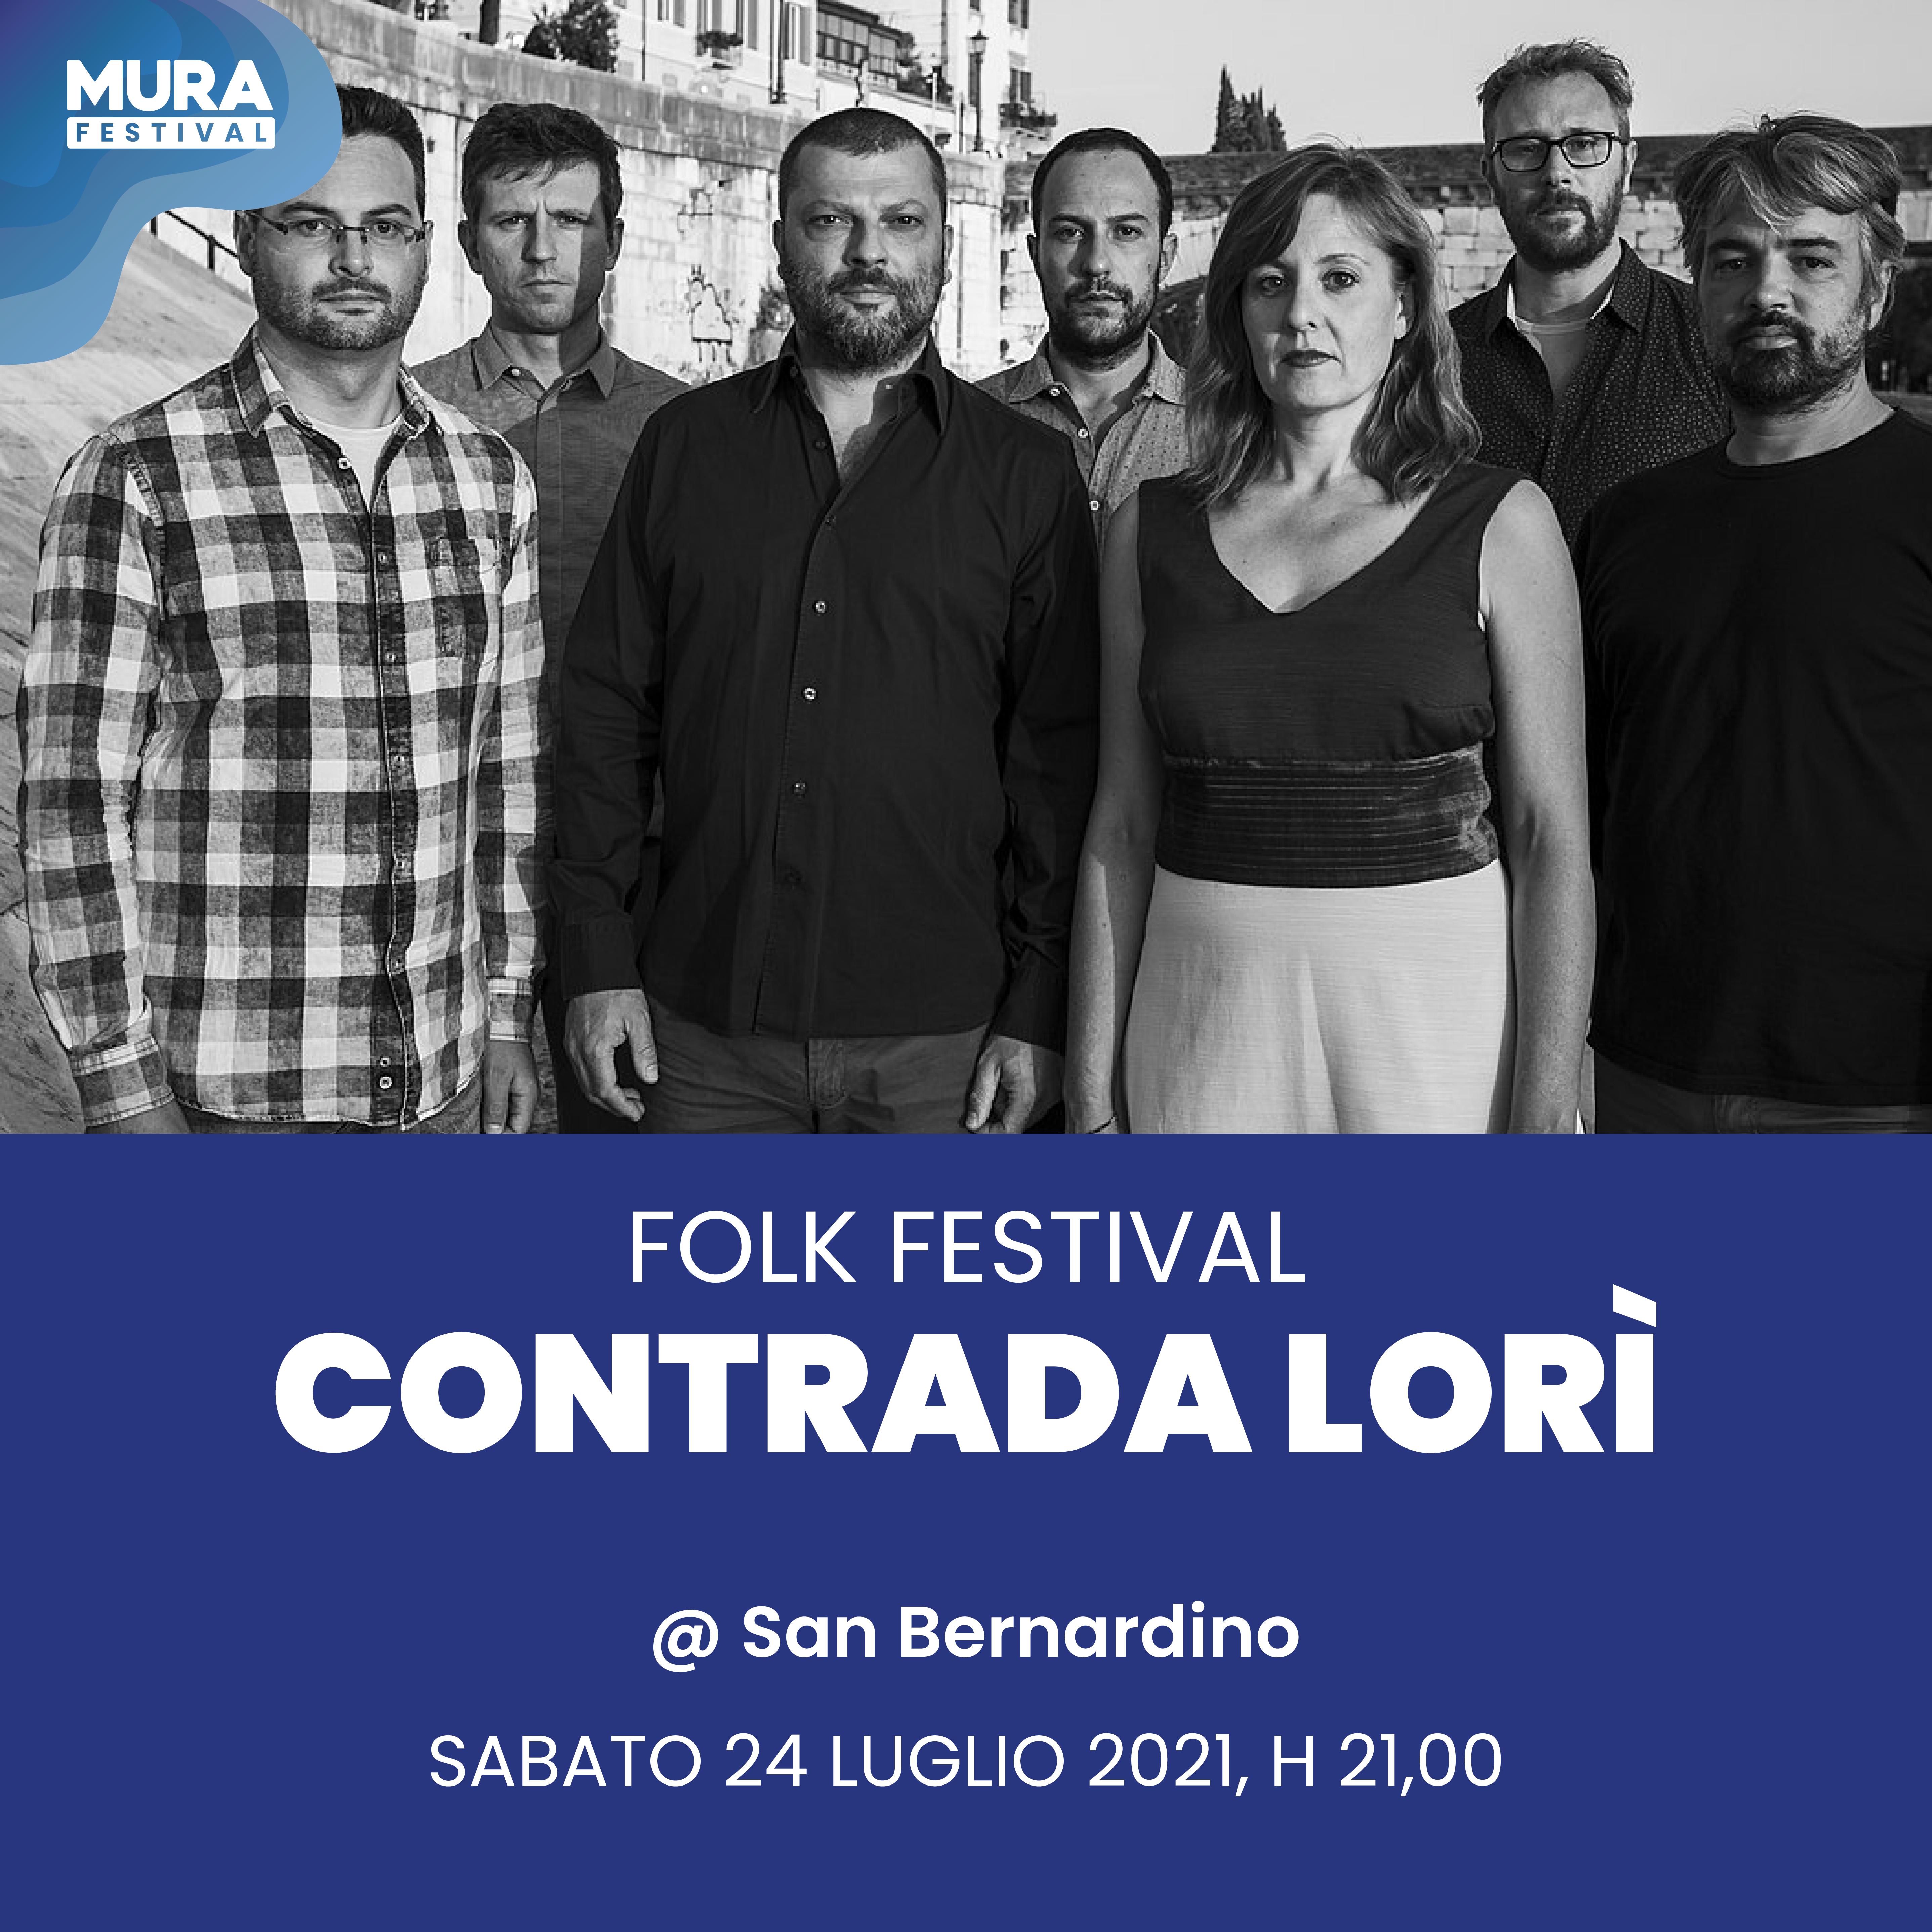 Contrada Lorì - Mura Festival